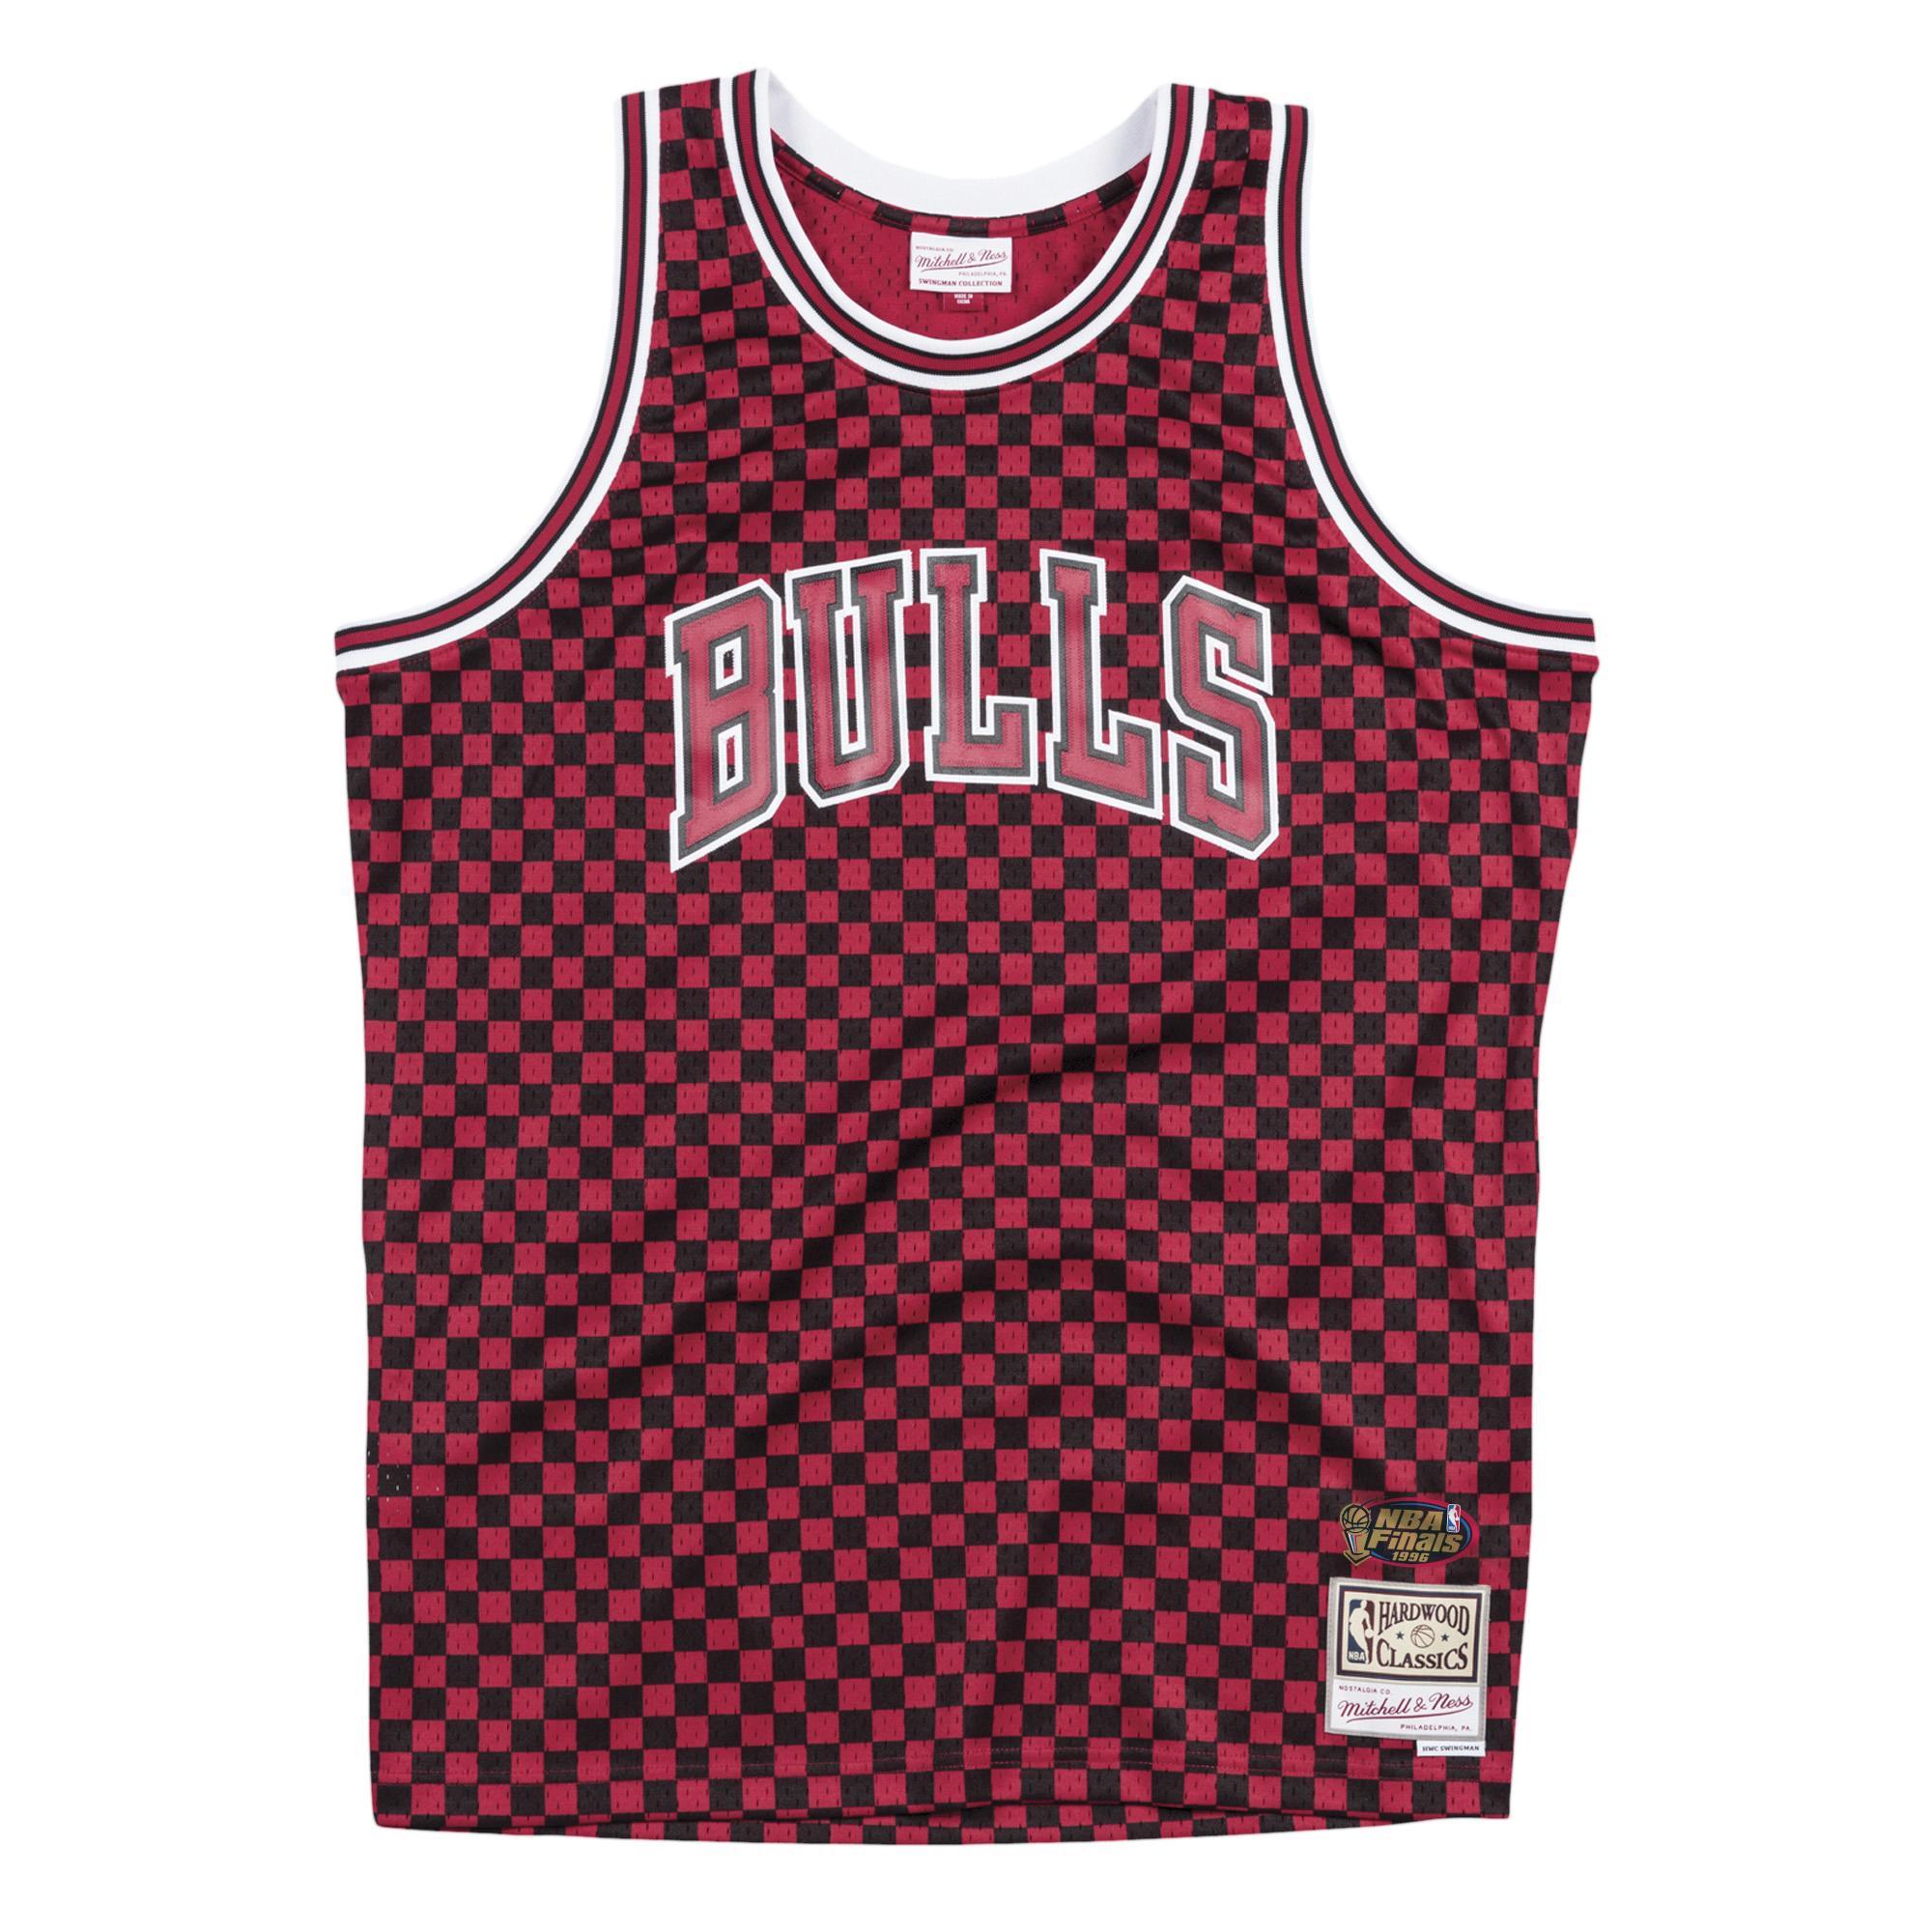 size 40 25f4c 7fb6e Mitchell & Ness | Chicago Bulls Black & Red Checkered ...